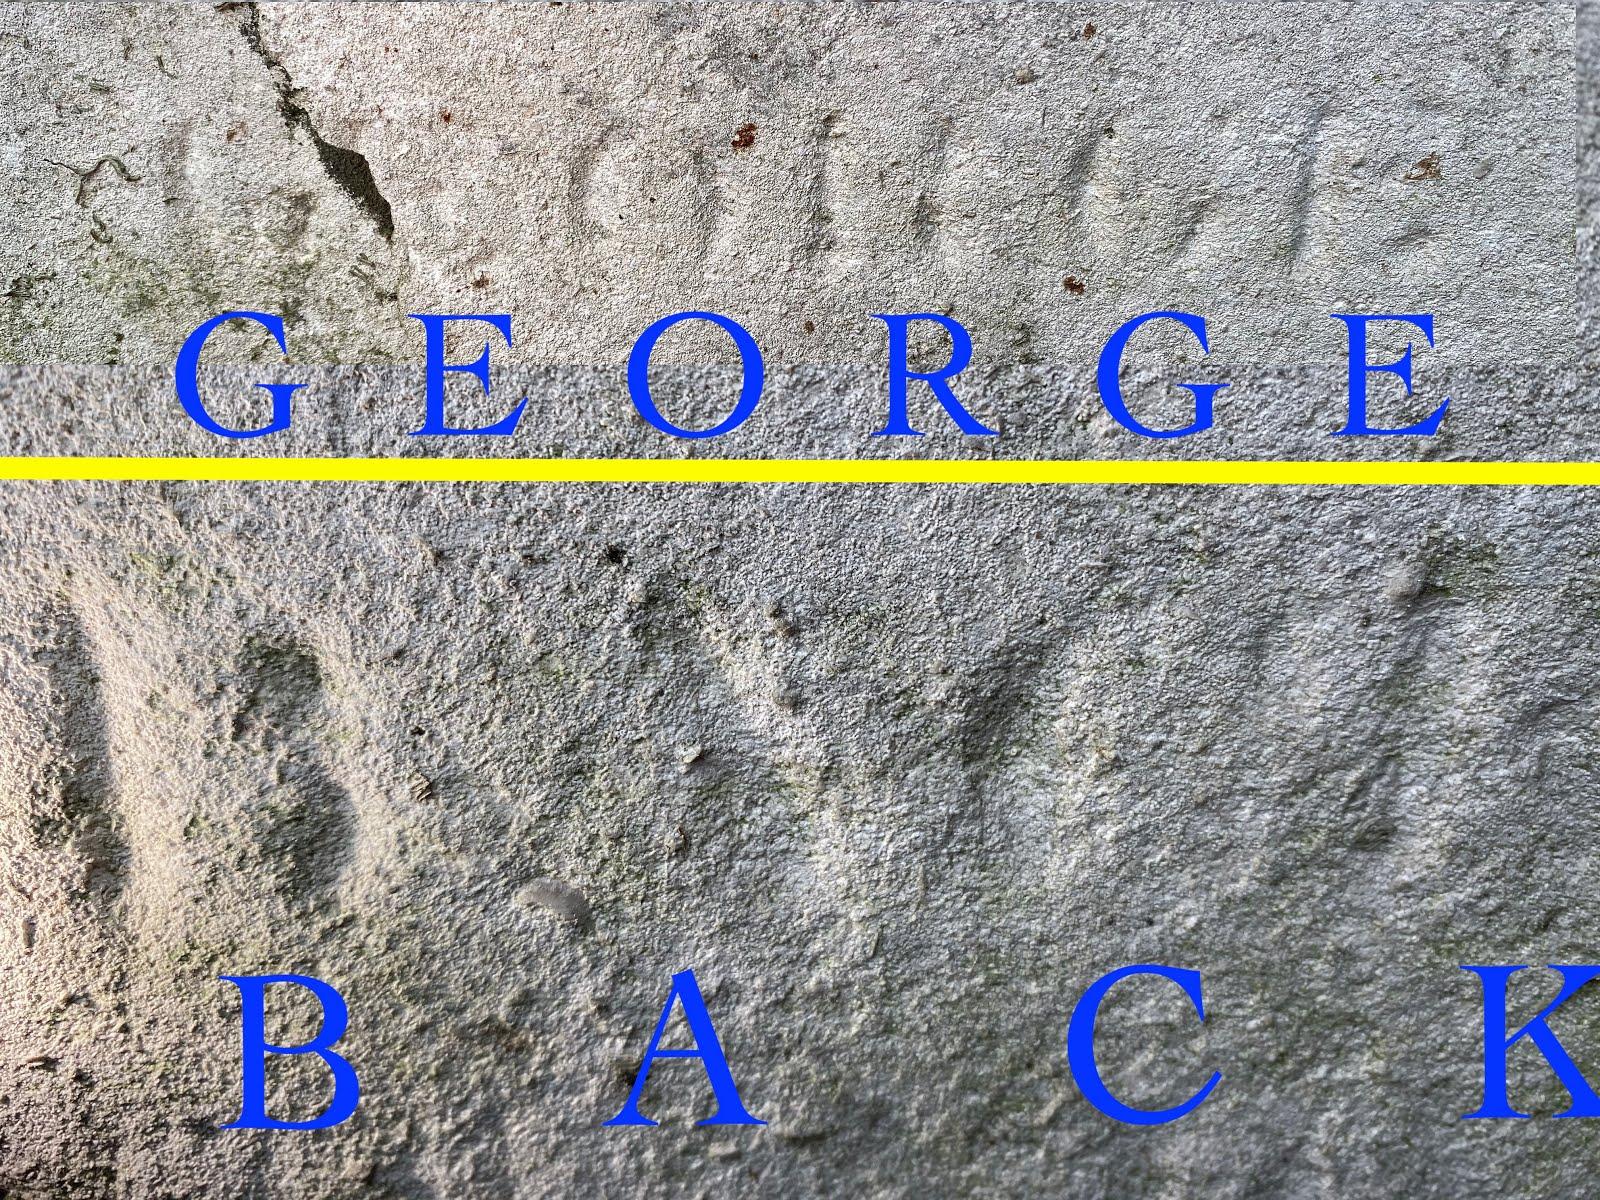 Back's inscription.